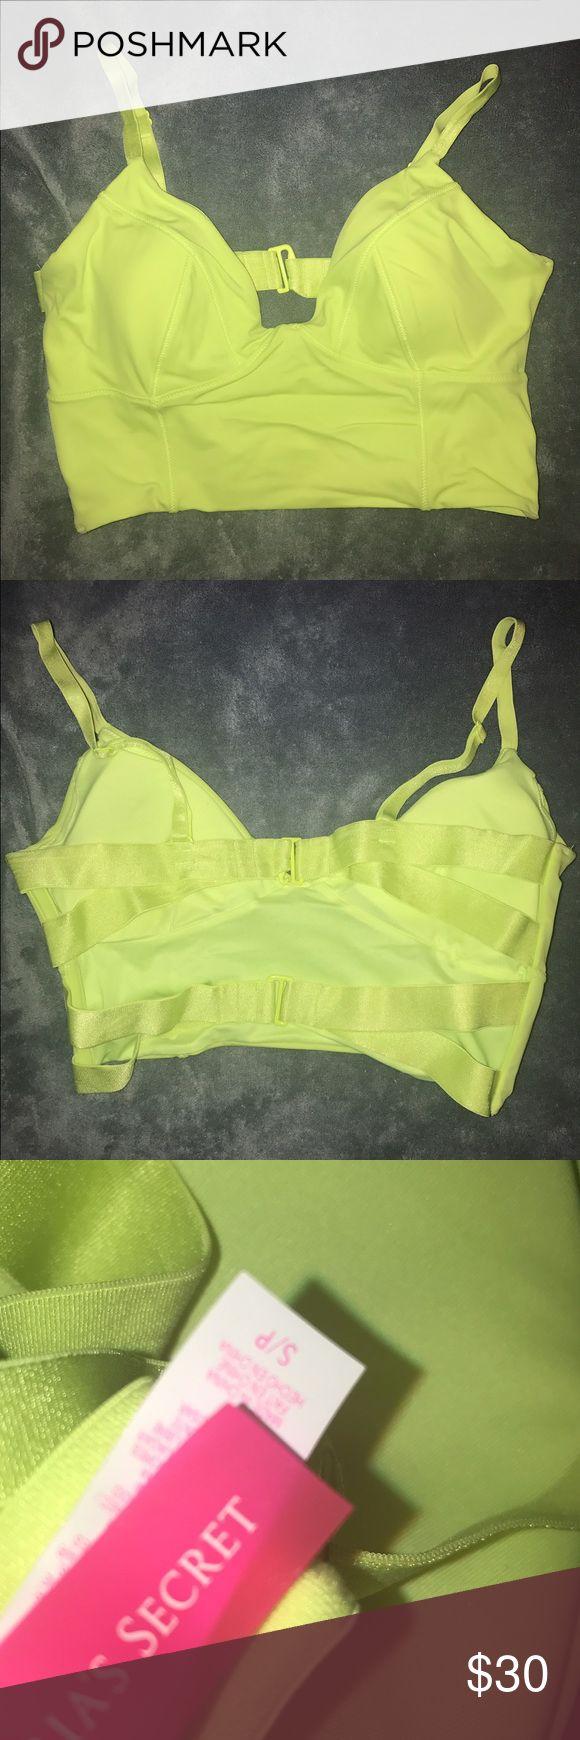 Victoria Secret Bikini Top Neon Victoria's Secret Swim Bikinis